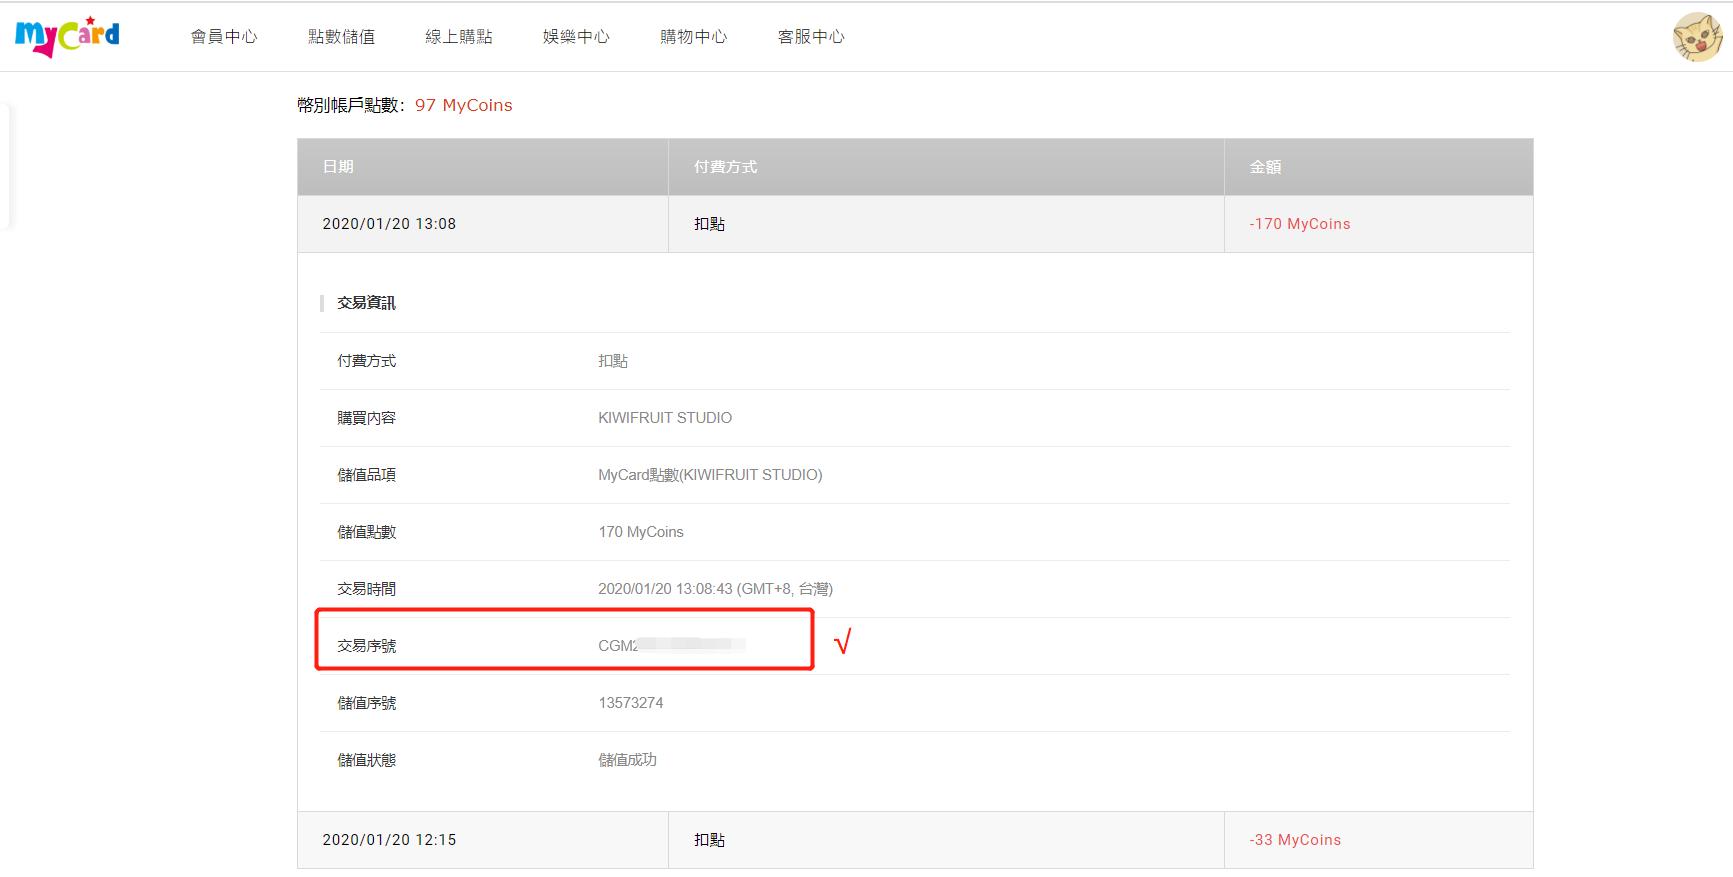 Mycard储值活动详细流程指南-交易序号.png